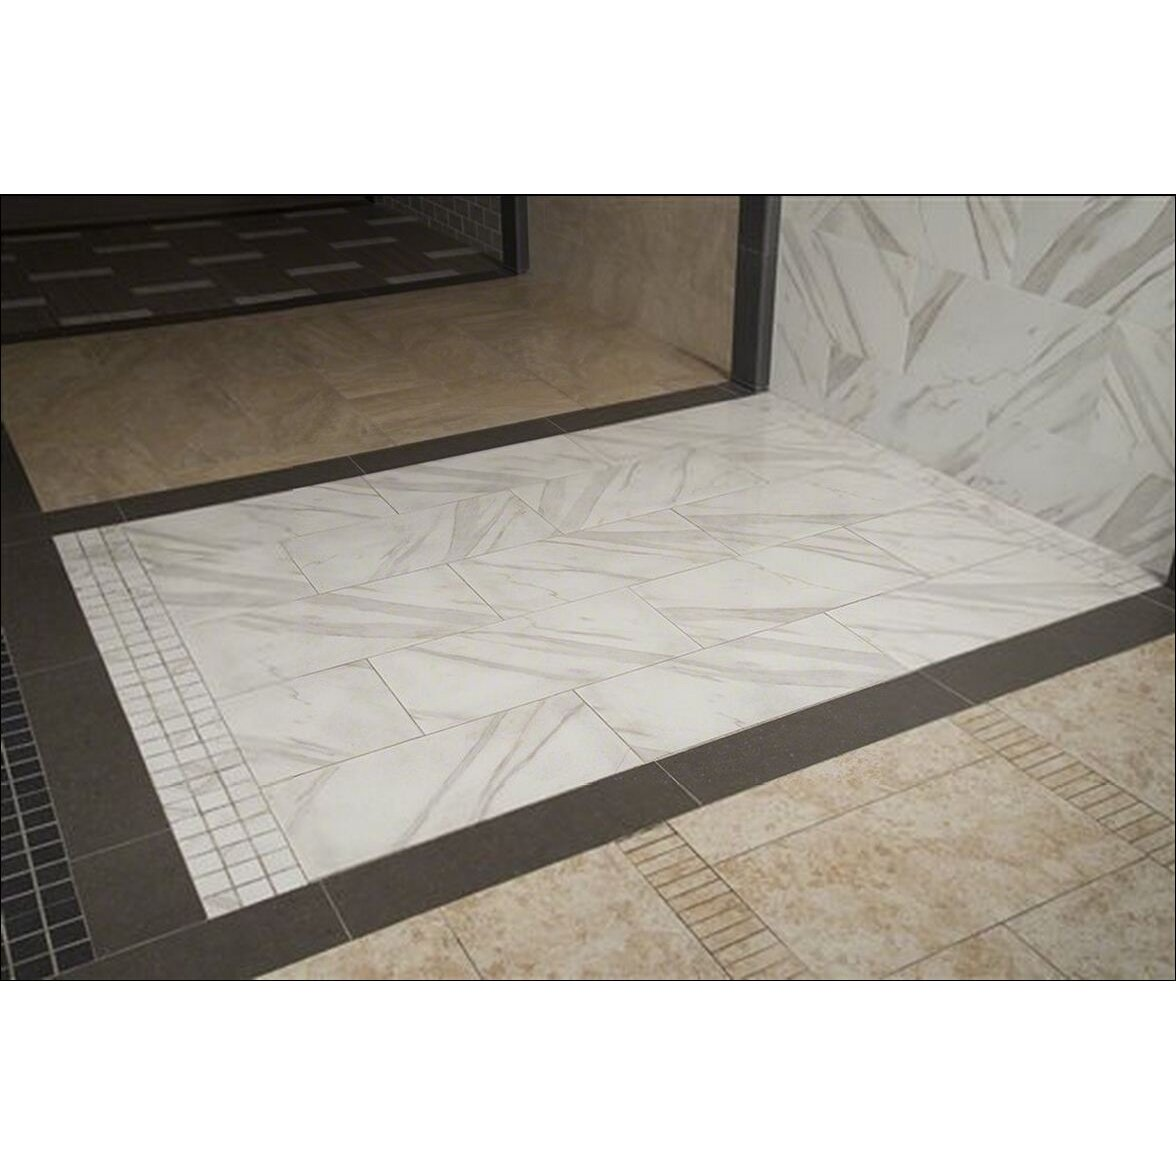 Msi pietra calacatta 12 x 12 porcelain field tile in for 12 x 12 white floor tile